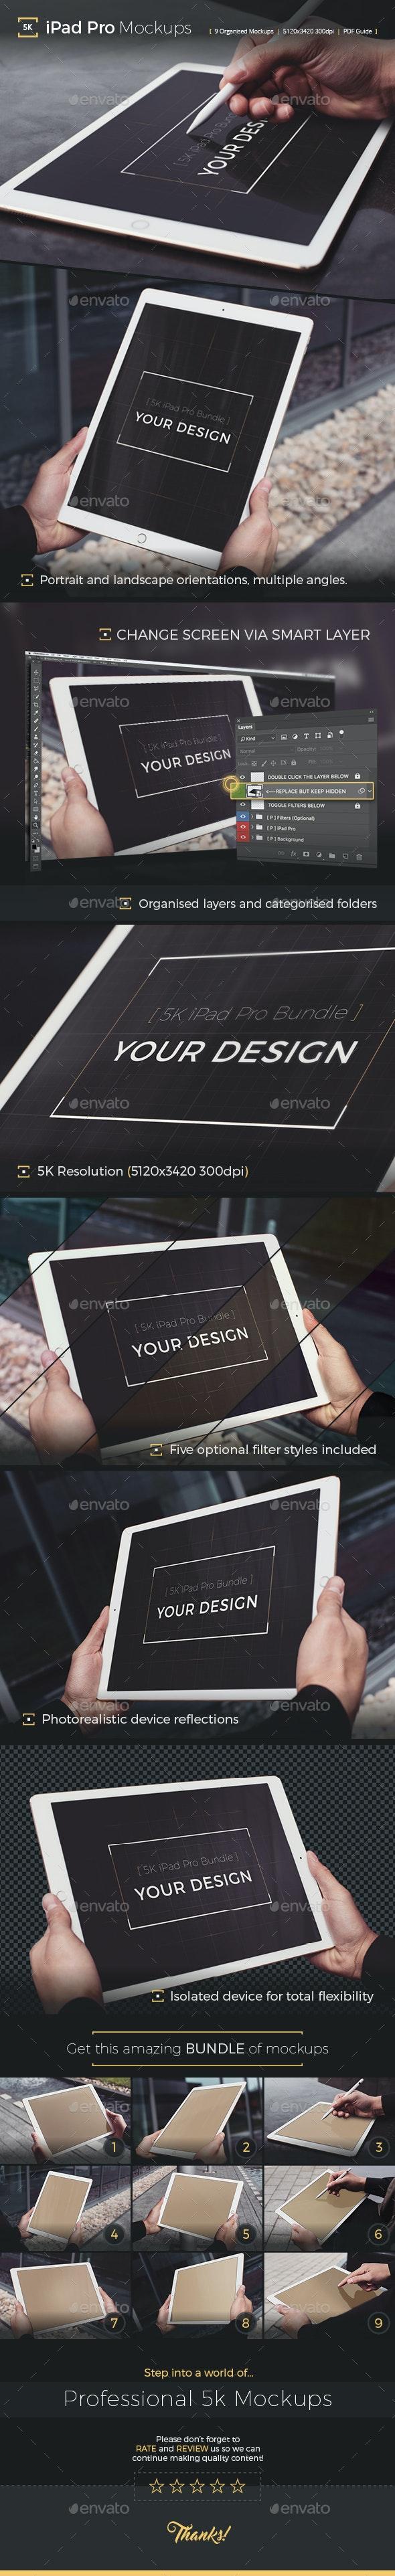 Pad Pro 5K Photorealistic Tablet Mockup - Mobile Displays